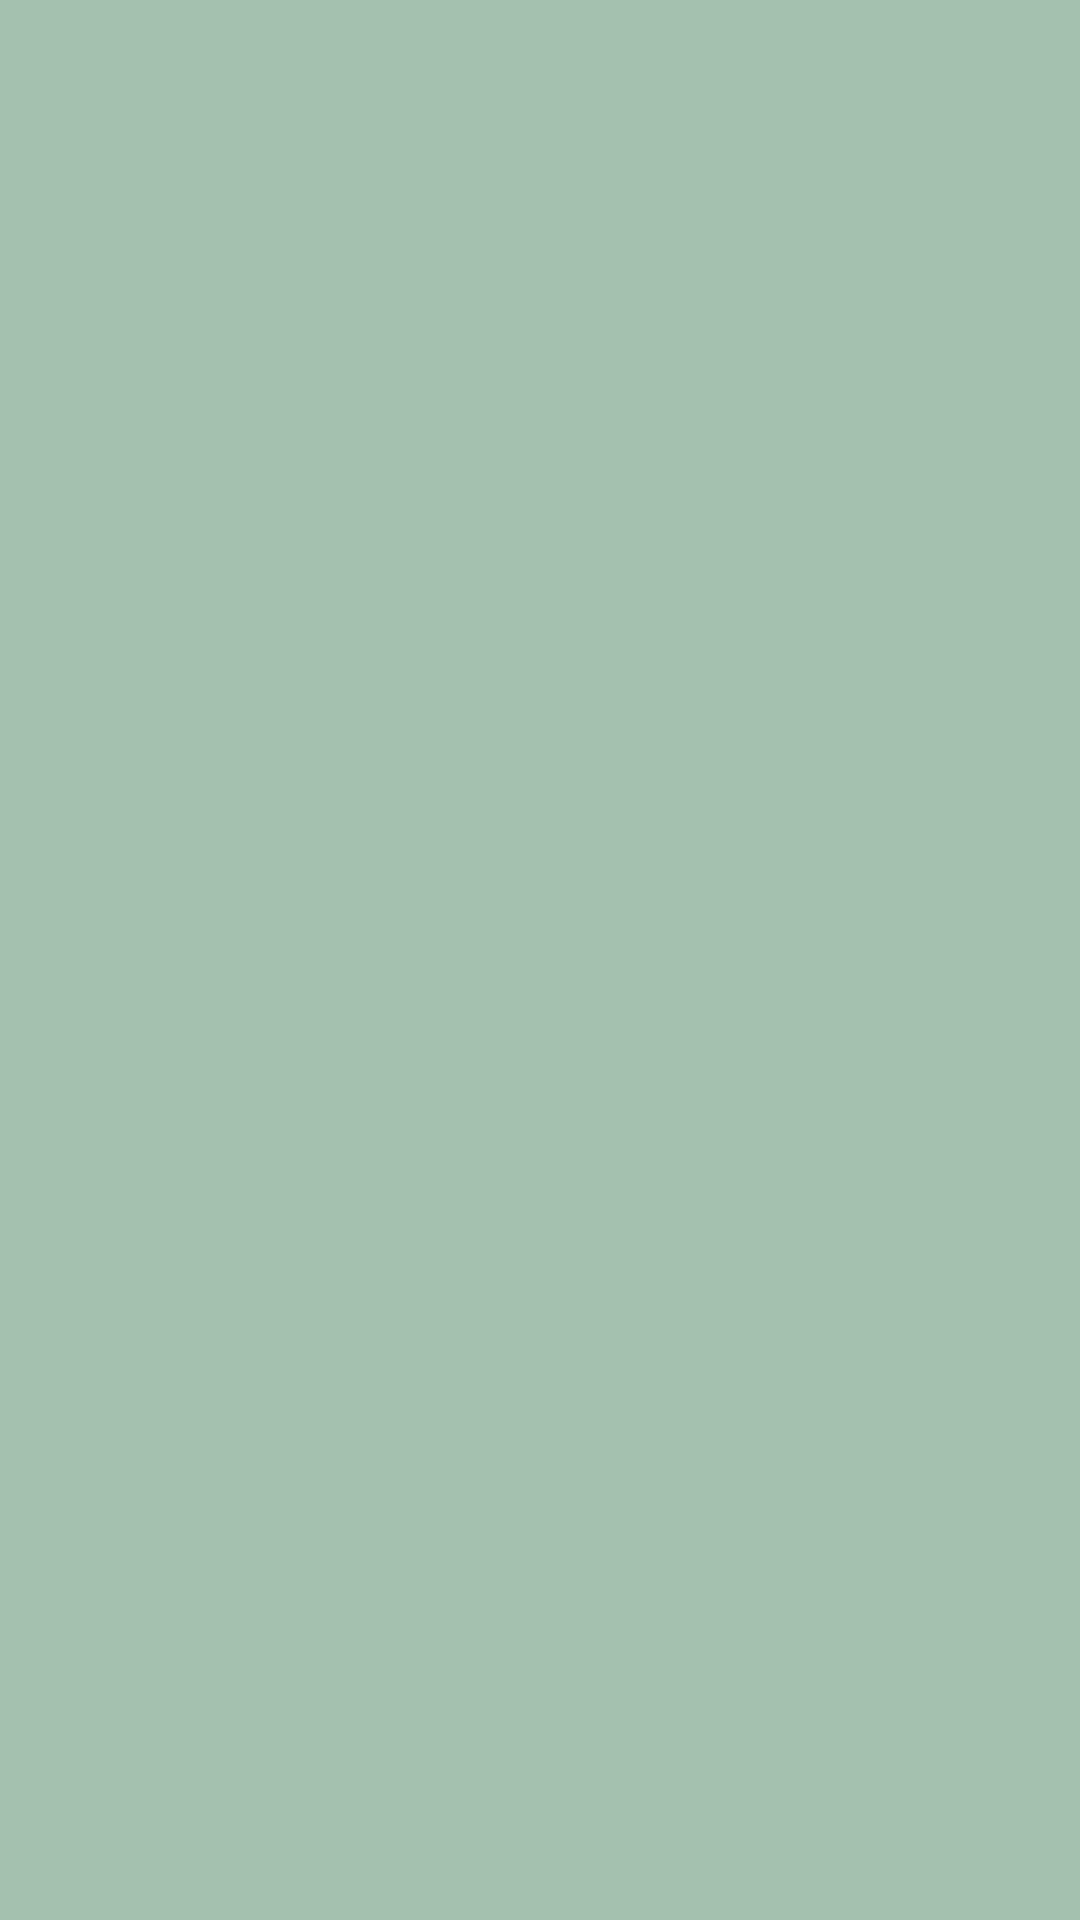 1080x1920 Cambridge Blue Solid Color Background